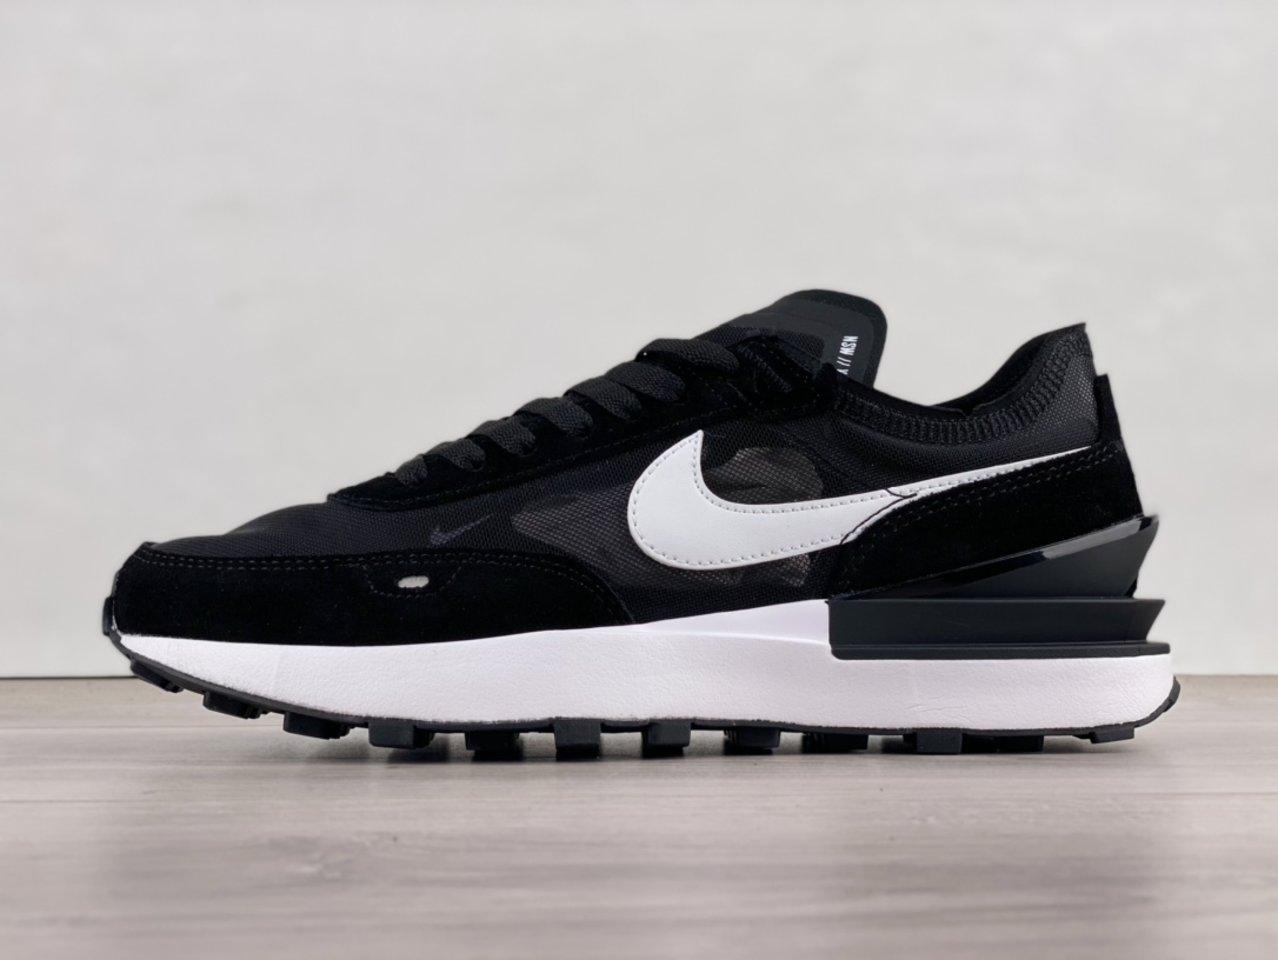 Nike Waffle One Black Running Shoes DC2533-001